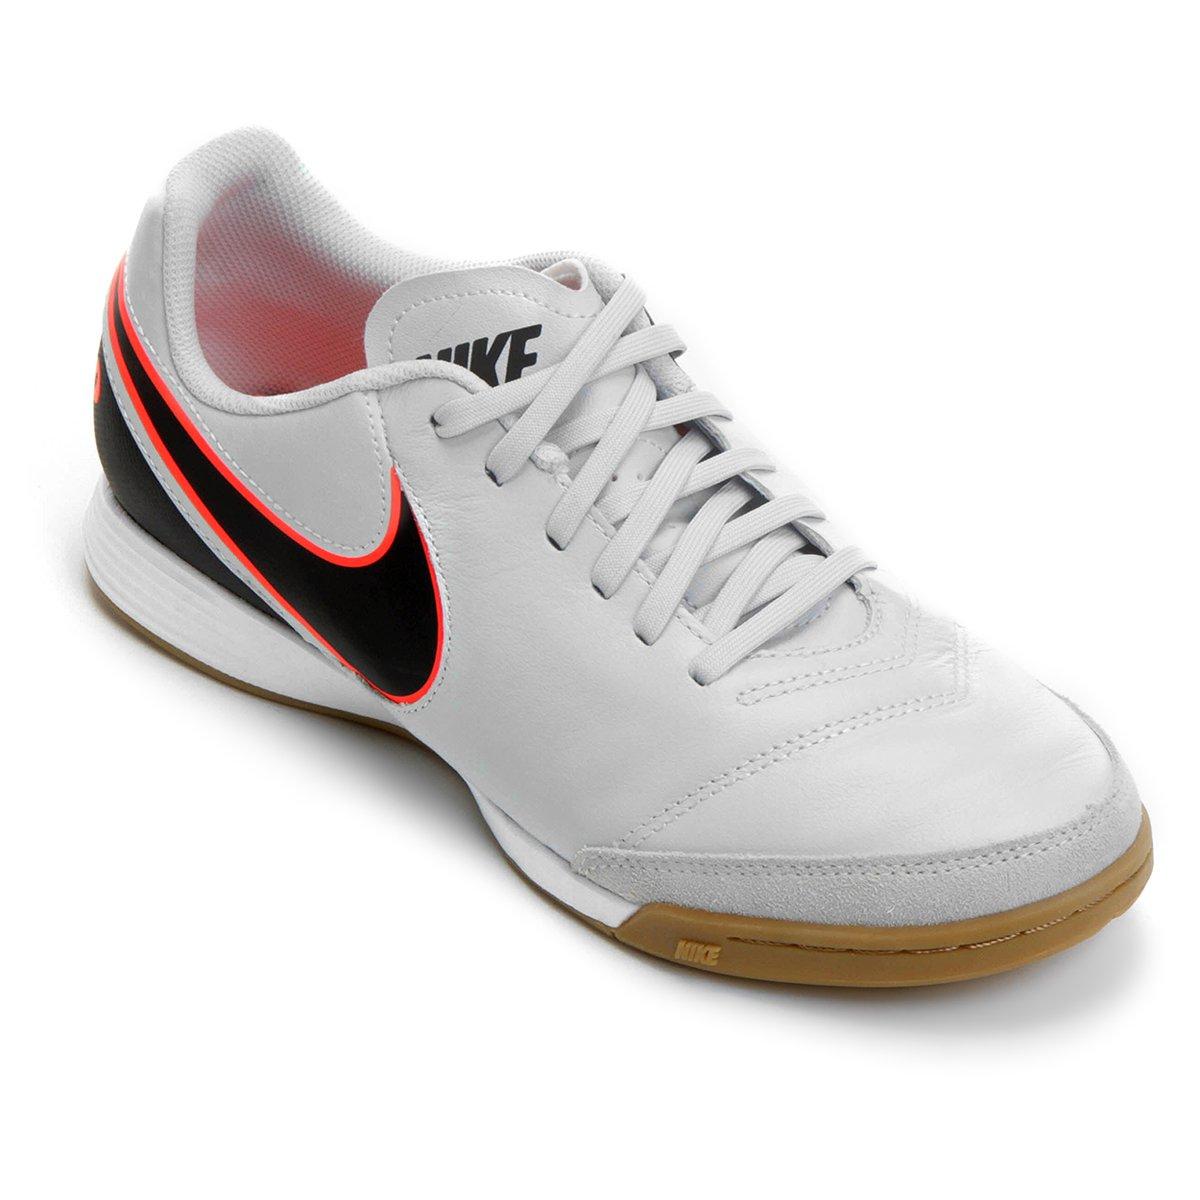 cdb7b2cc0995a Chuteira Futsal Nike Tiempo Genio 2 Leather IC Masculina - Compre Agora